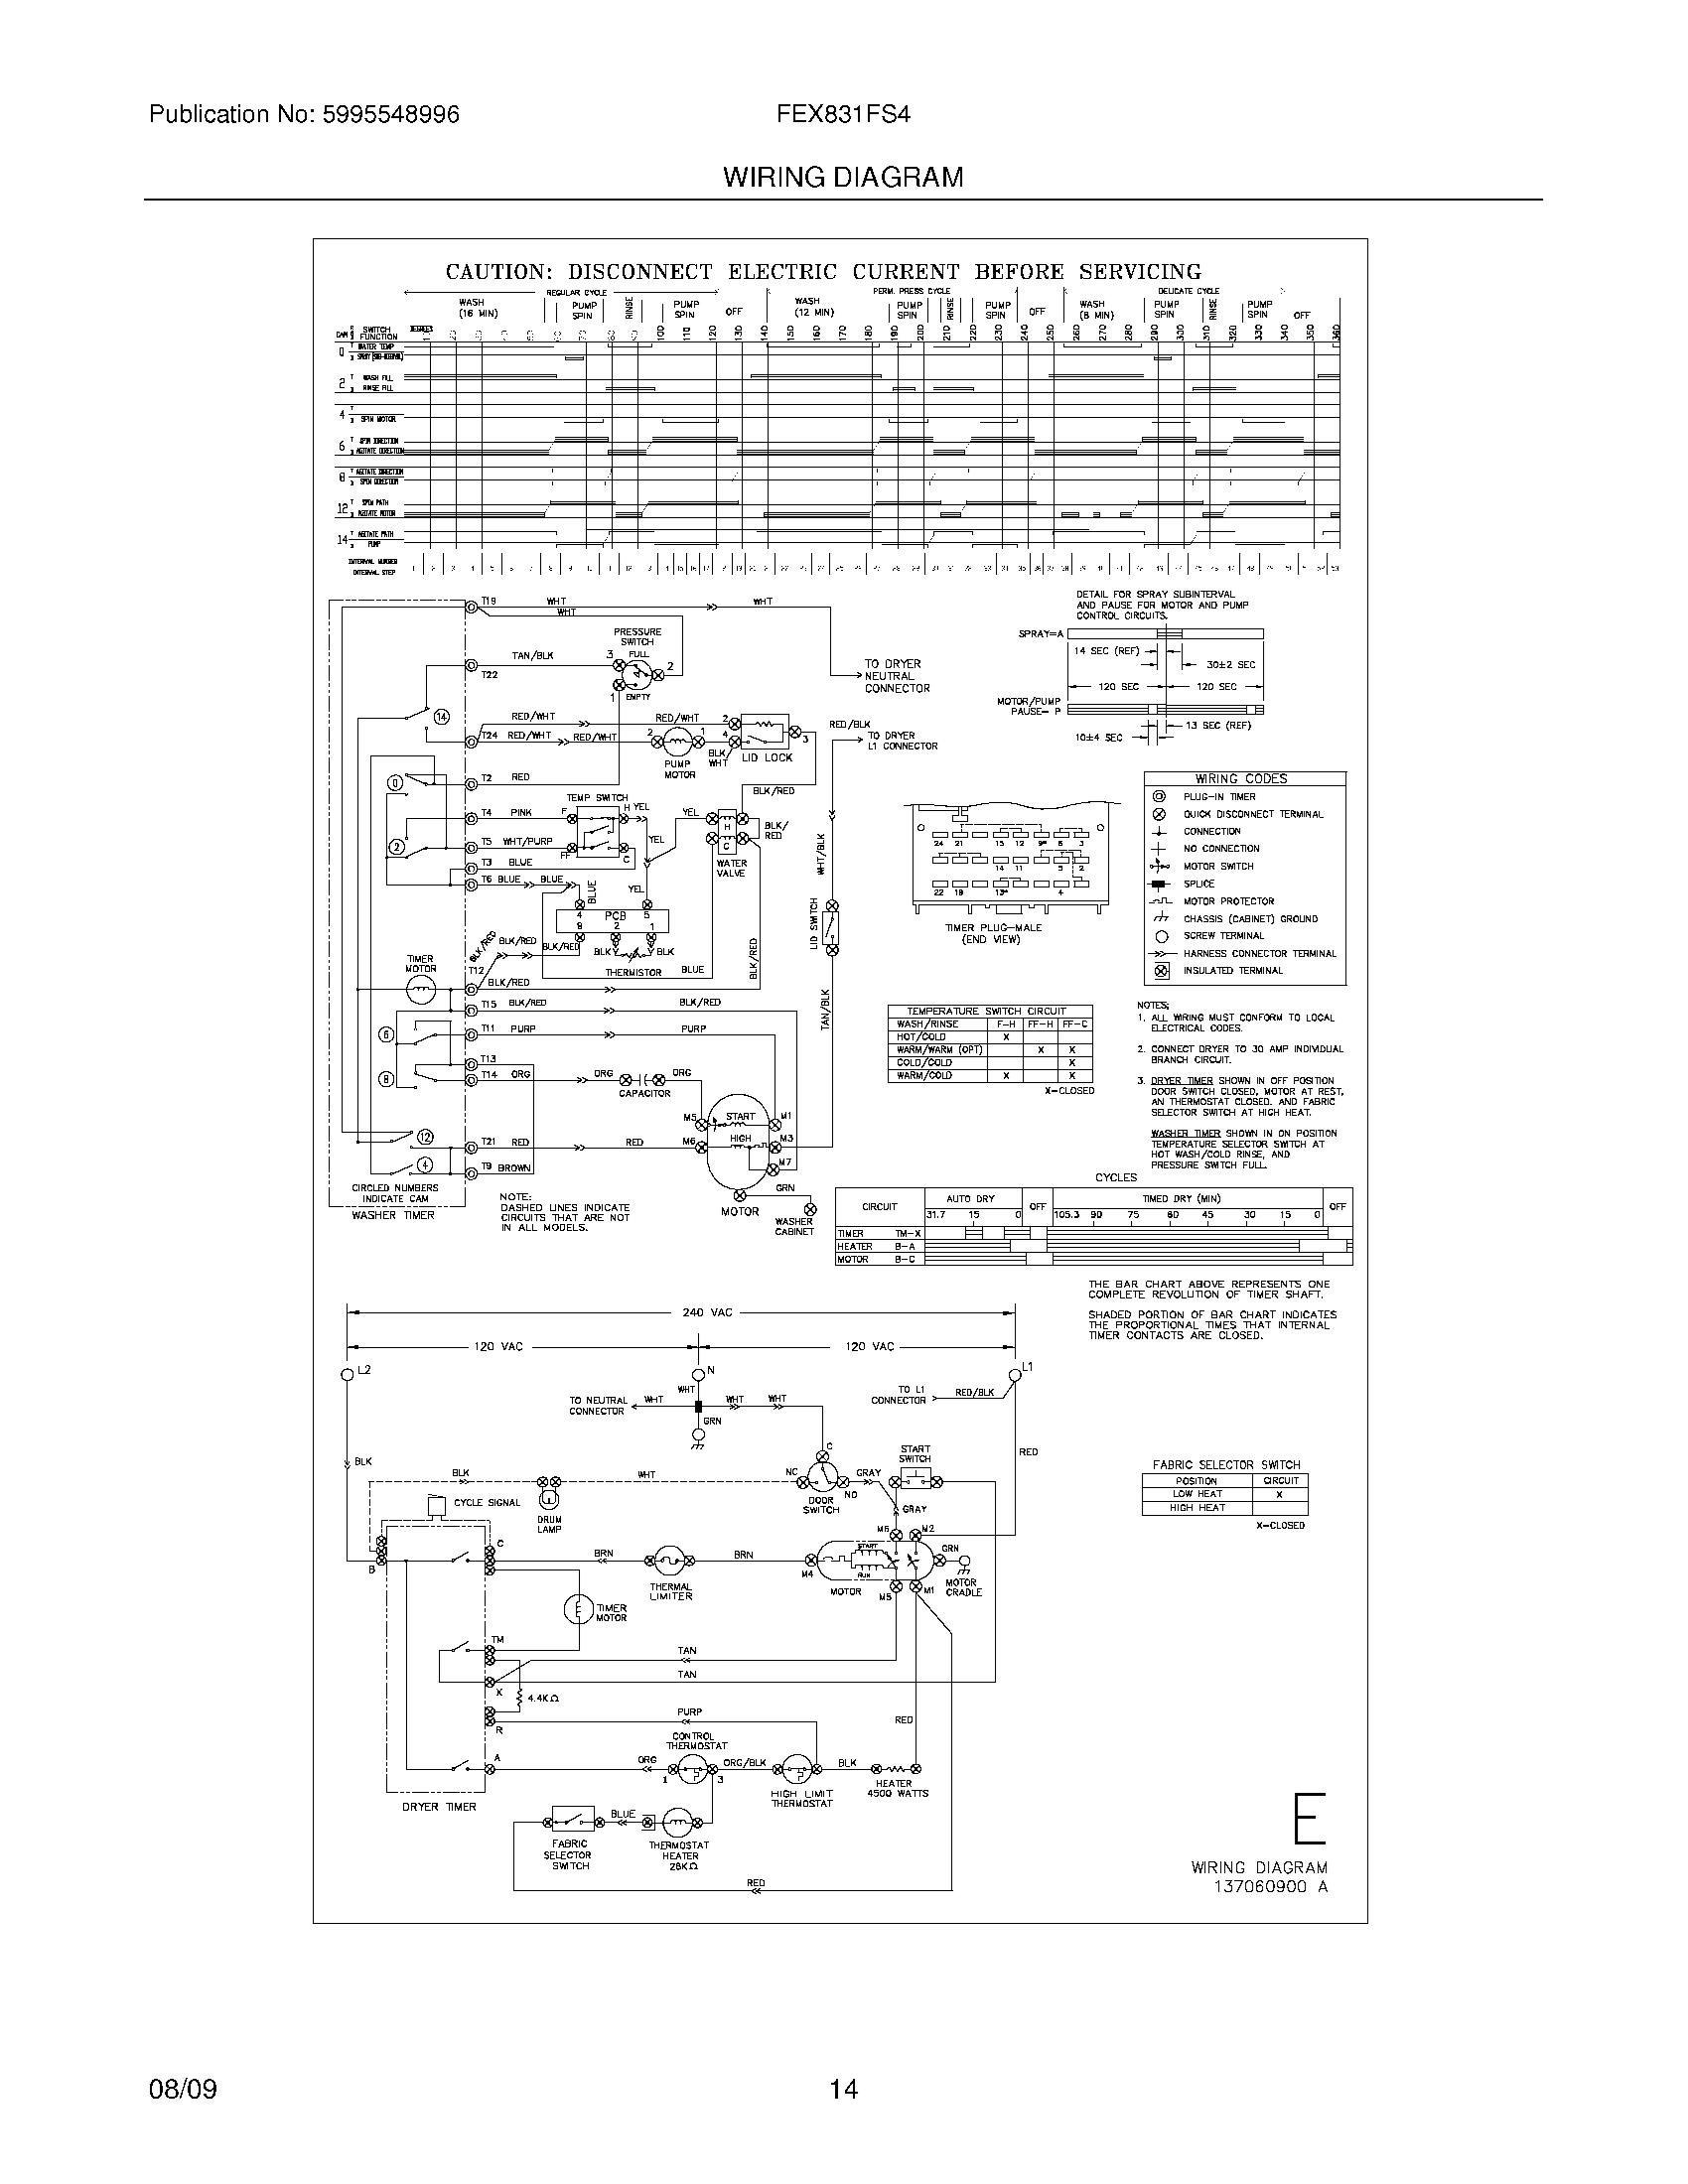 ElectroluxImg_19000101 20150717_00054183?width=1000 fex831fs4 frigidaire company appliance parts fex831fs4 wiring diagram at eliteediting.co